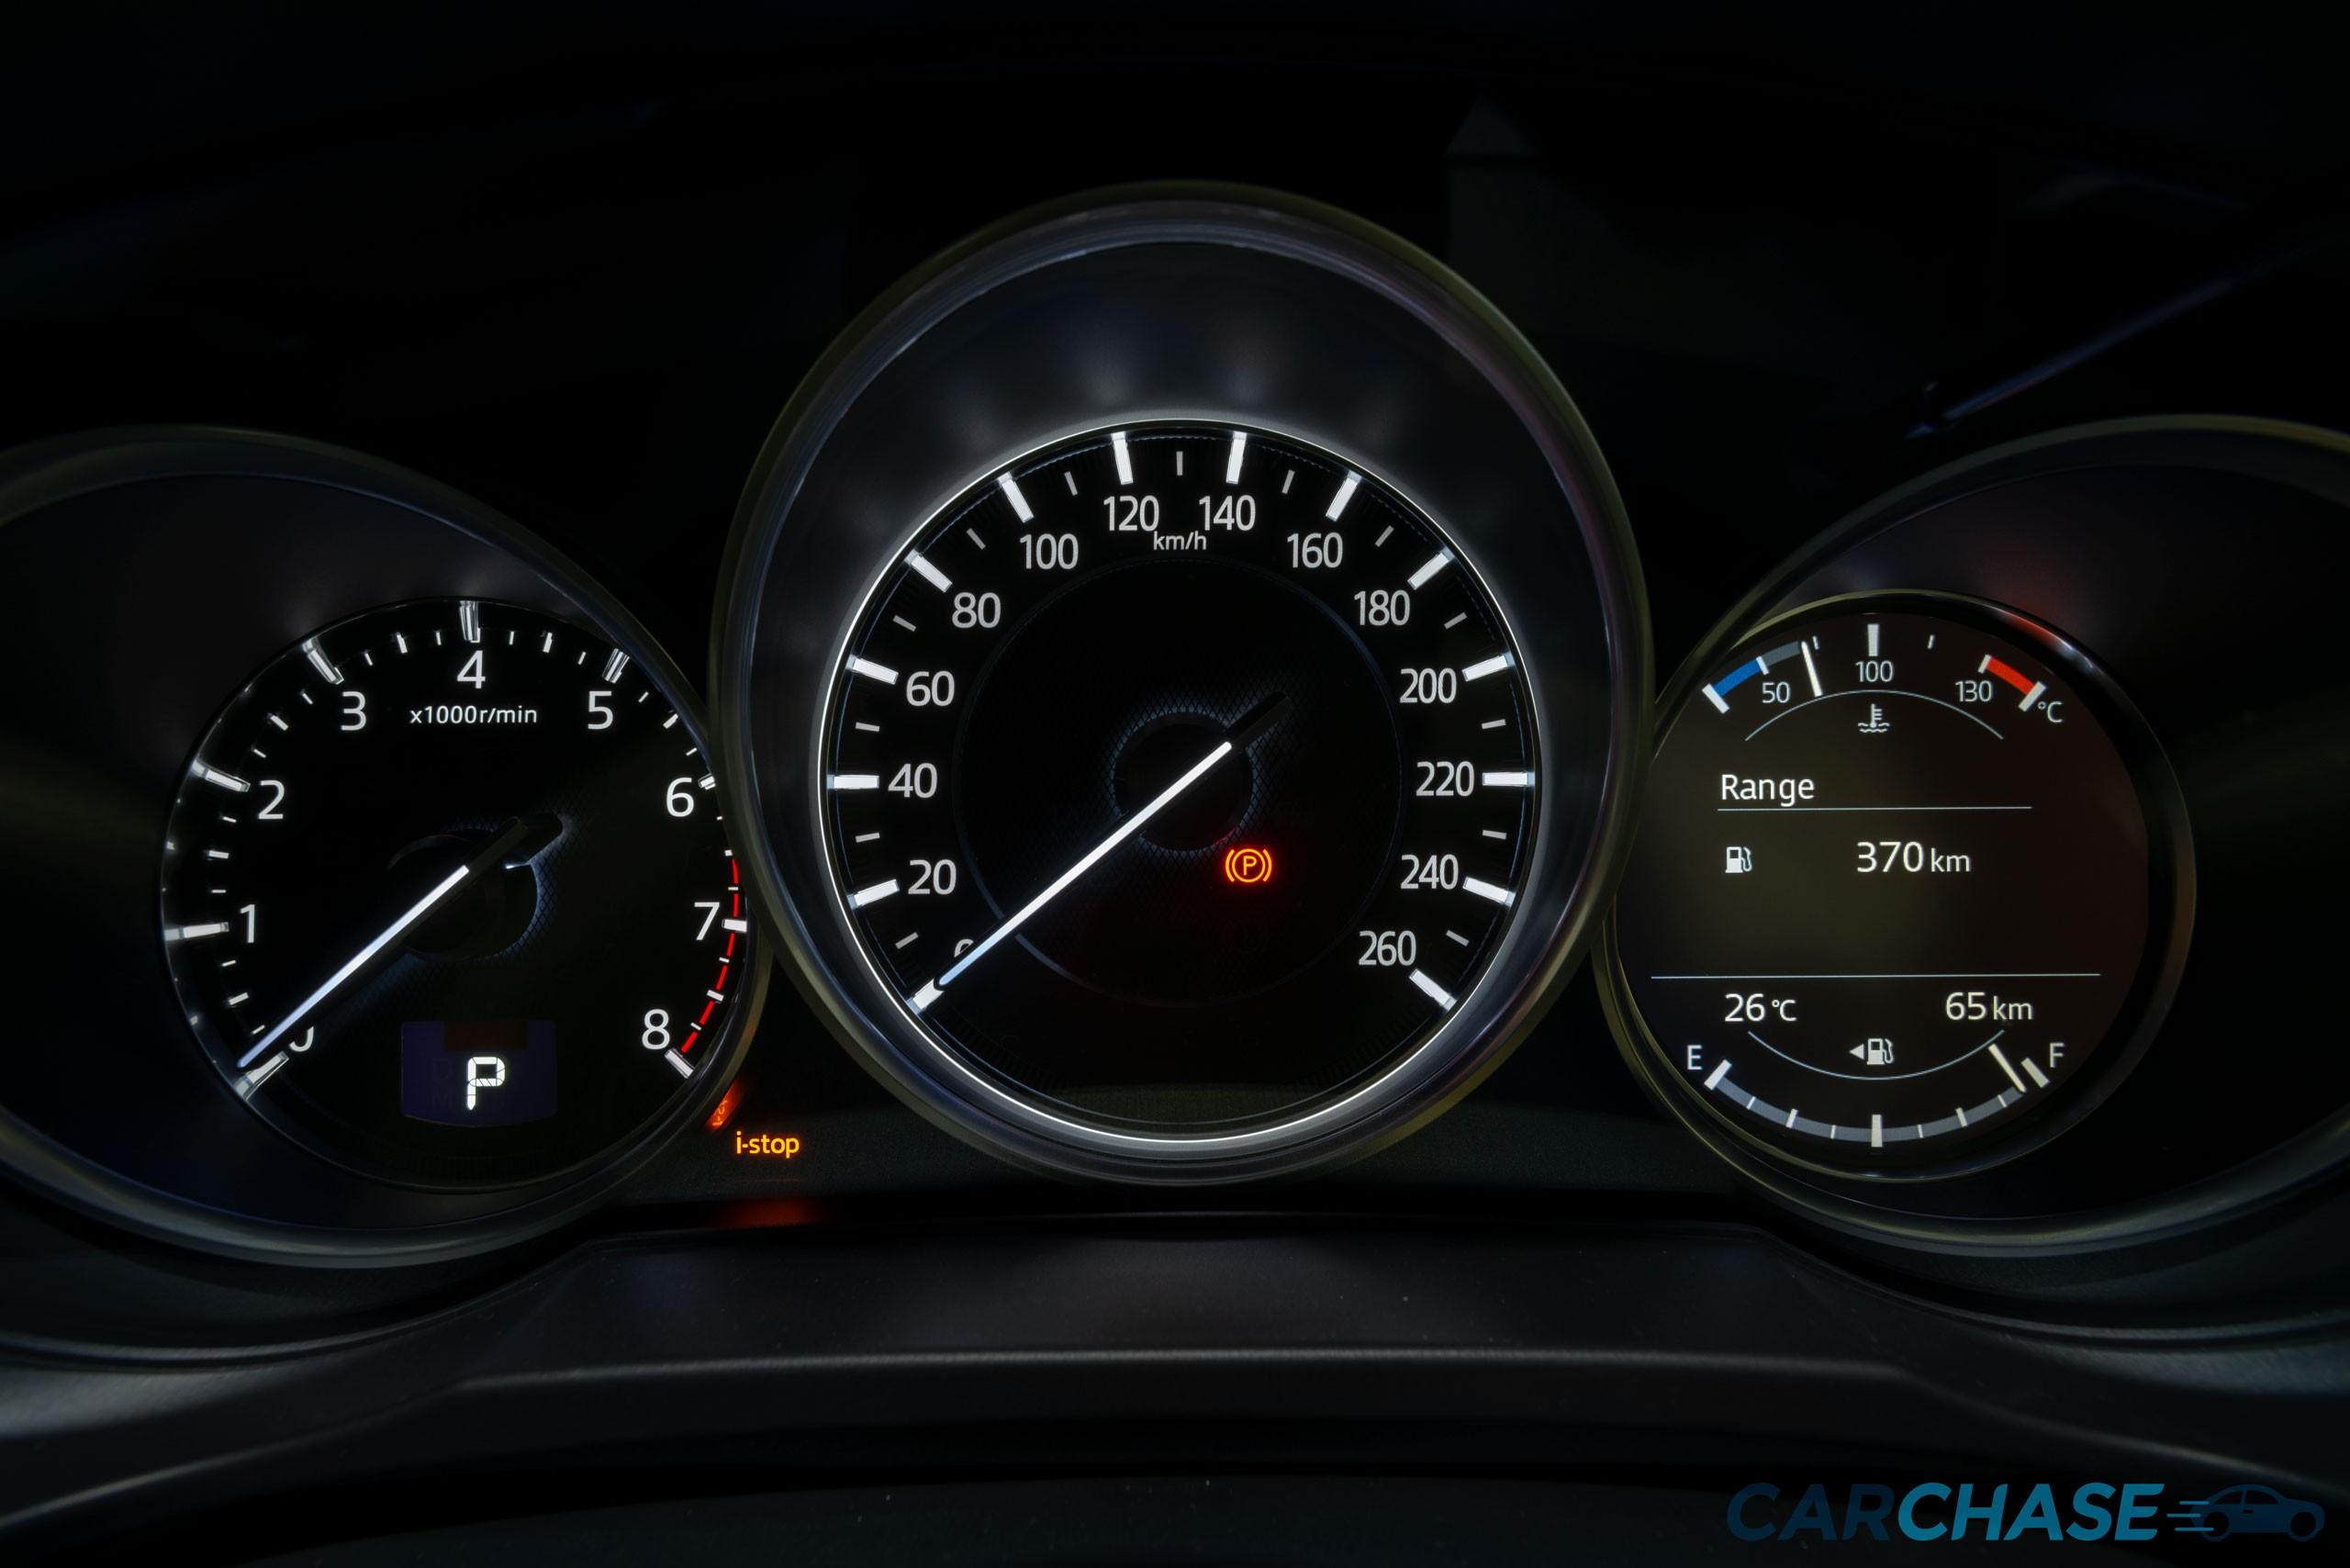 Image of dials profile of 2018 Mazda CX-5 GT